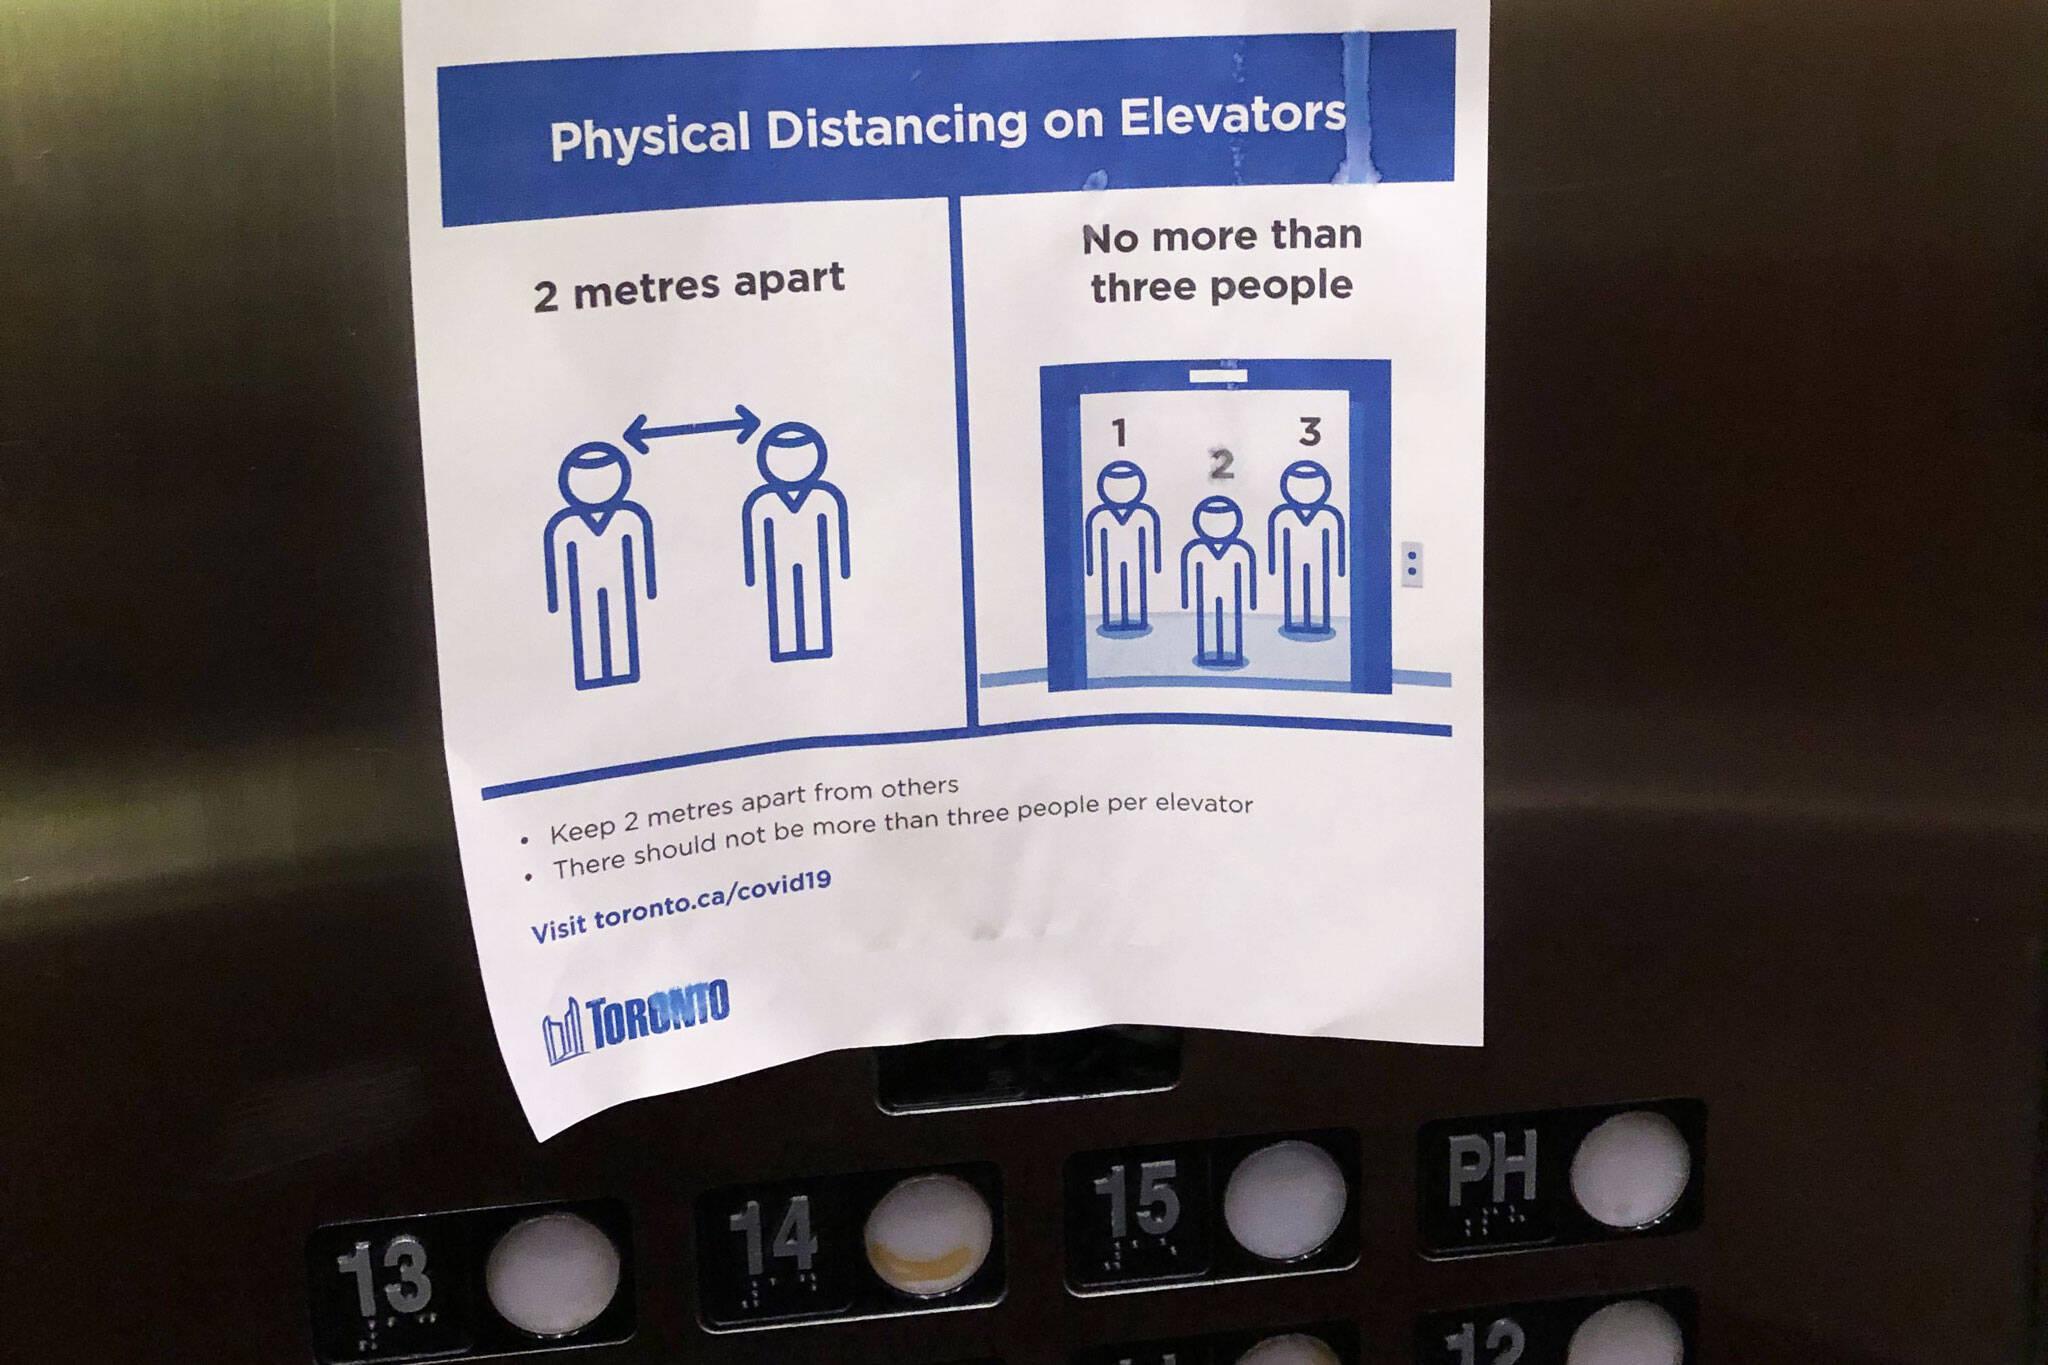 physical distancing elevators toronto